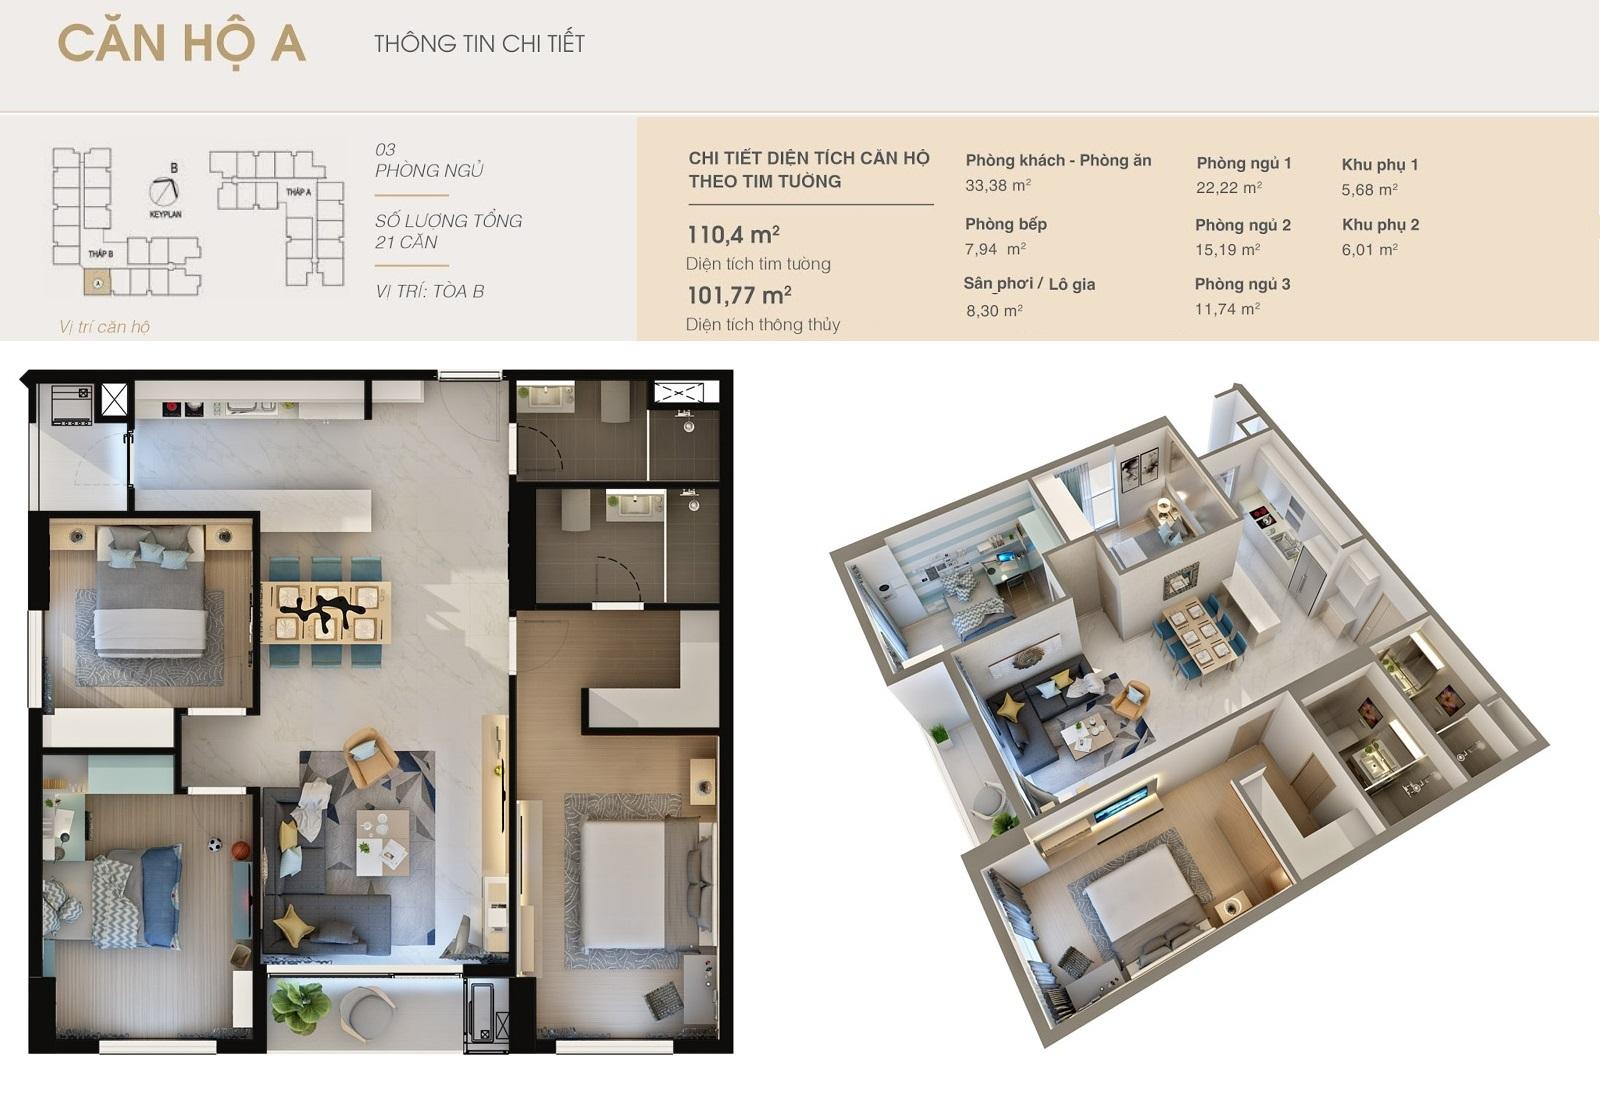 Thiết kế căn hộ A  Dlc complex